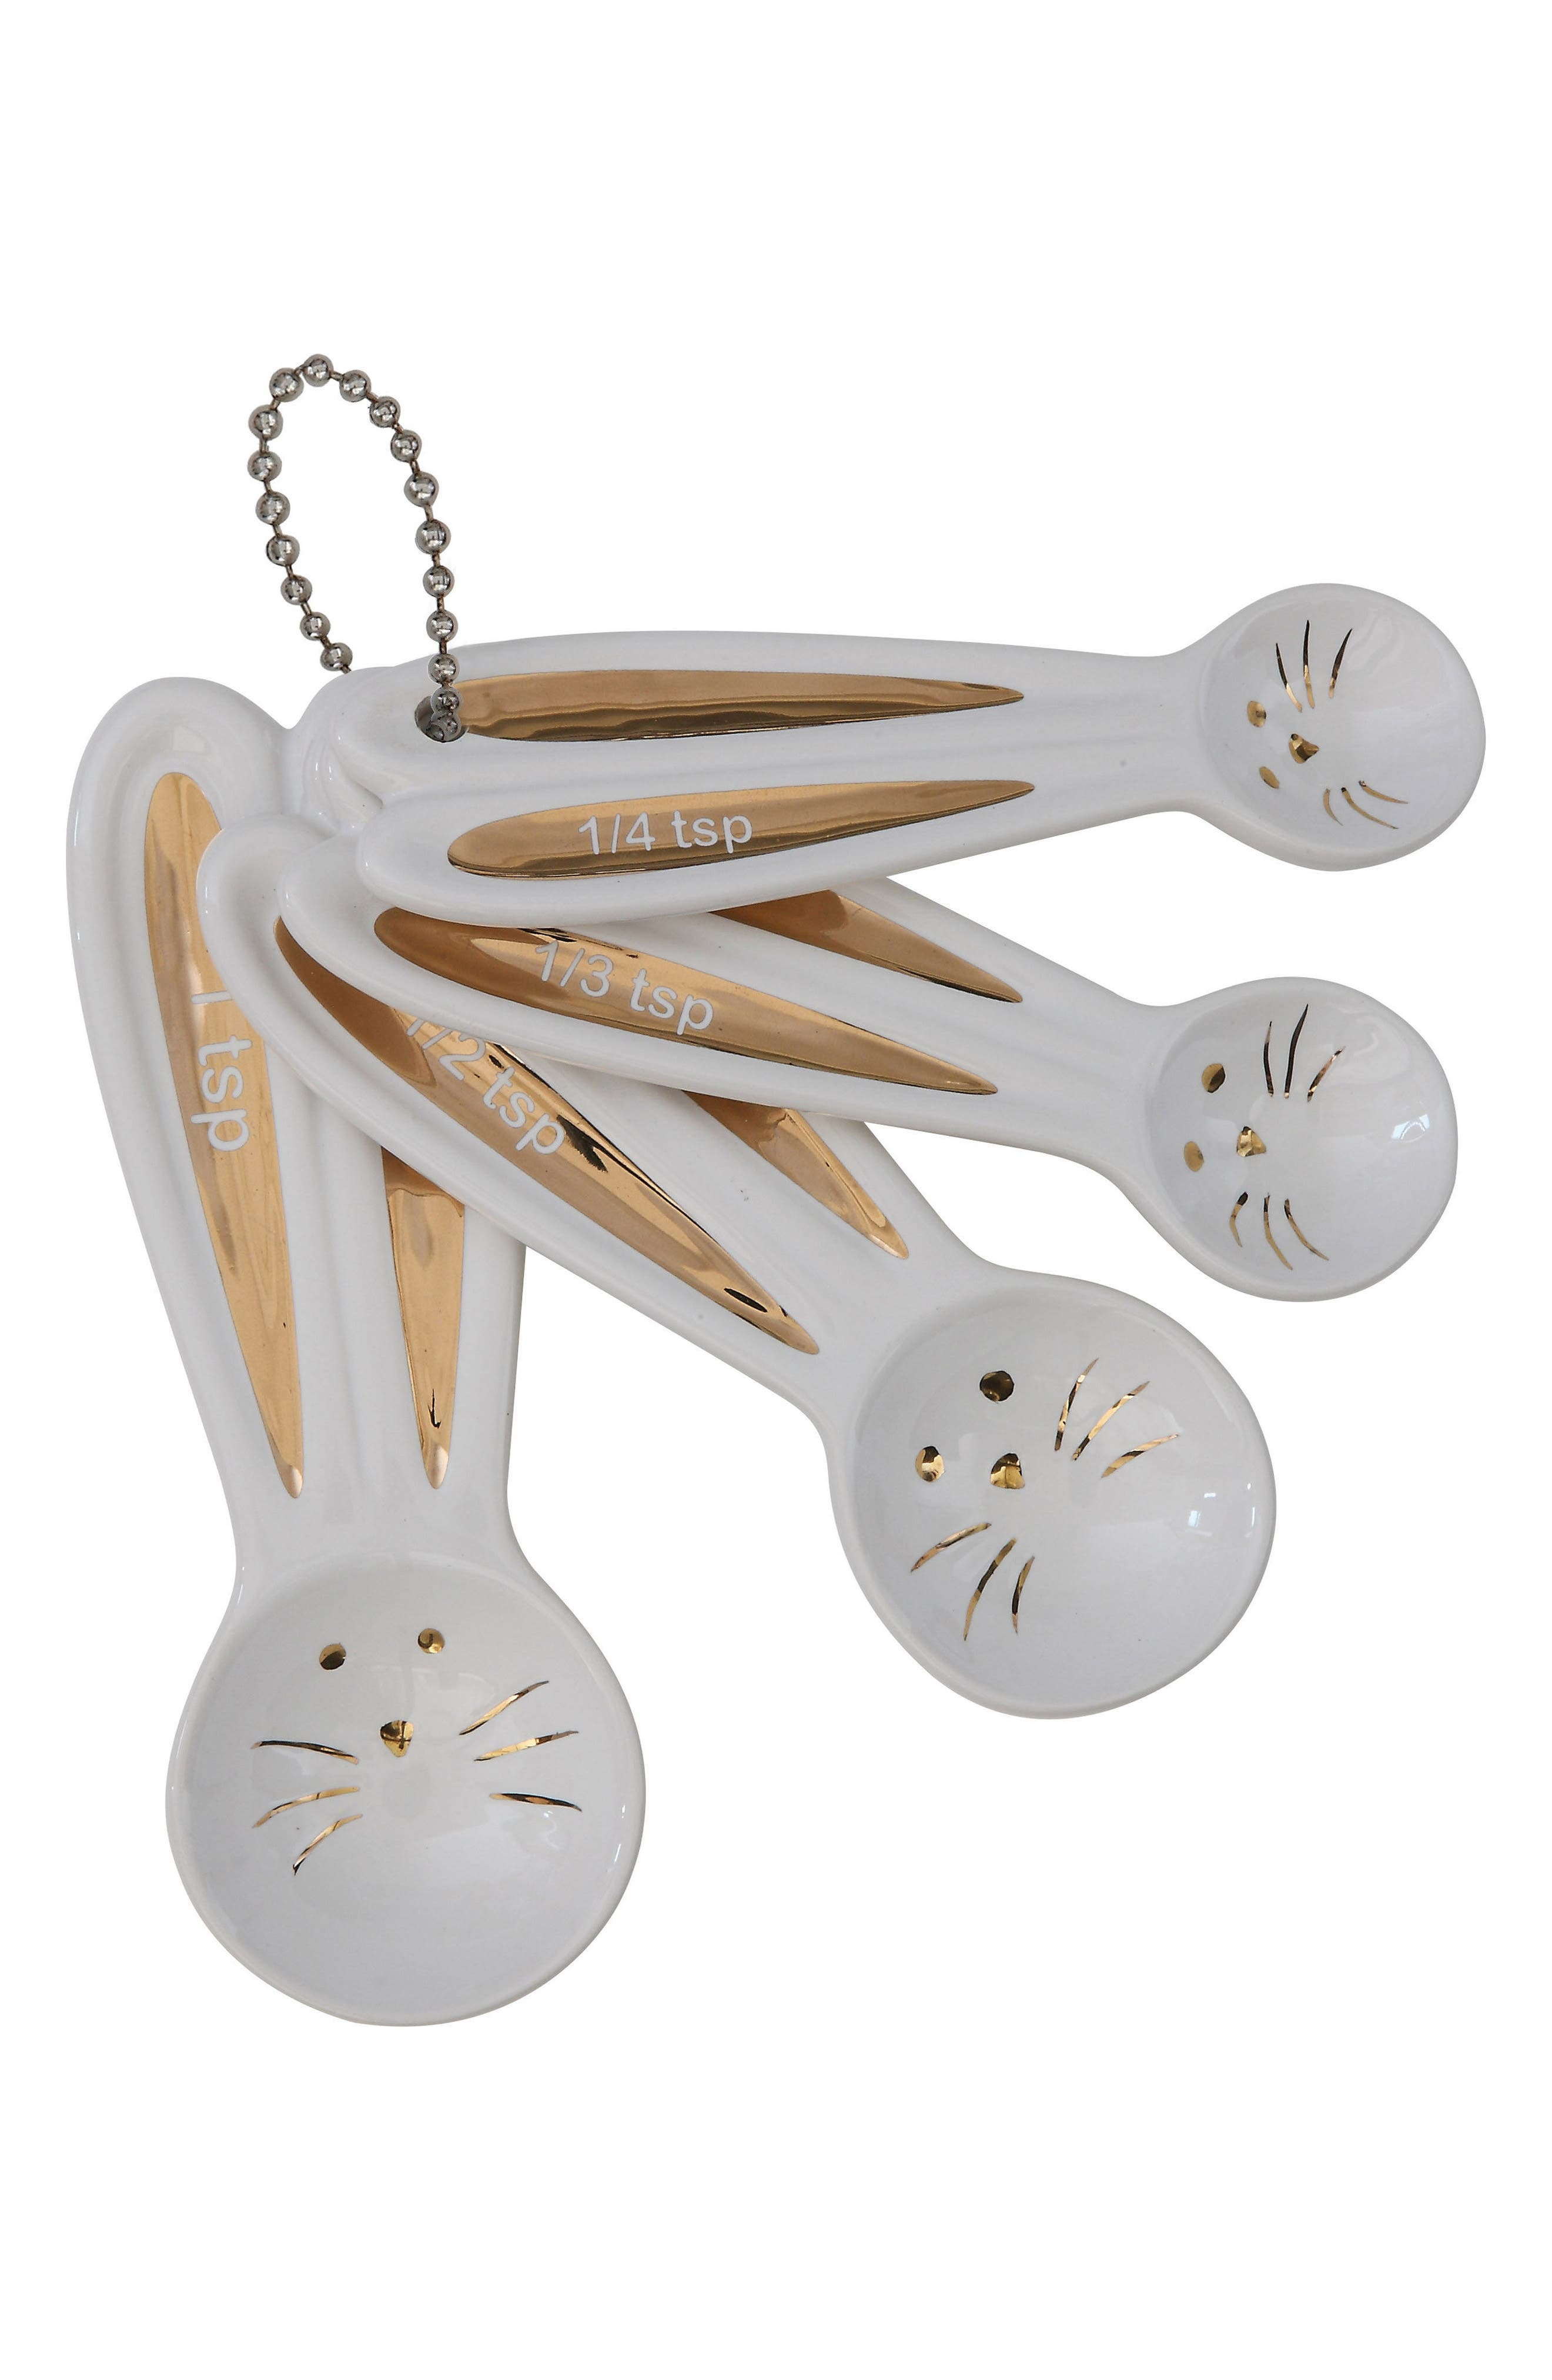 4-Piece Ceramic Bunny Measuring Spoons,                             Main thumbnail 1, color,                             White